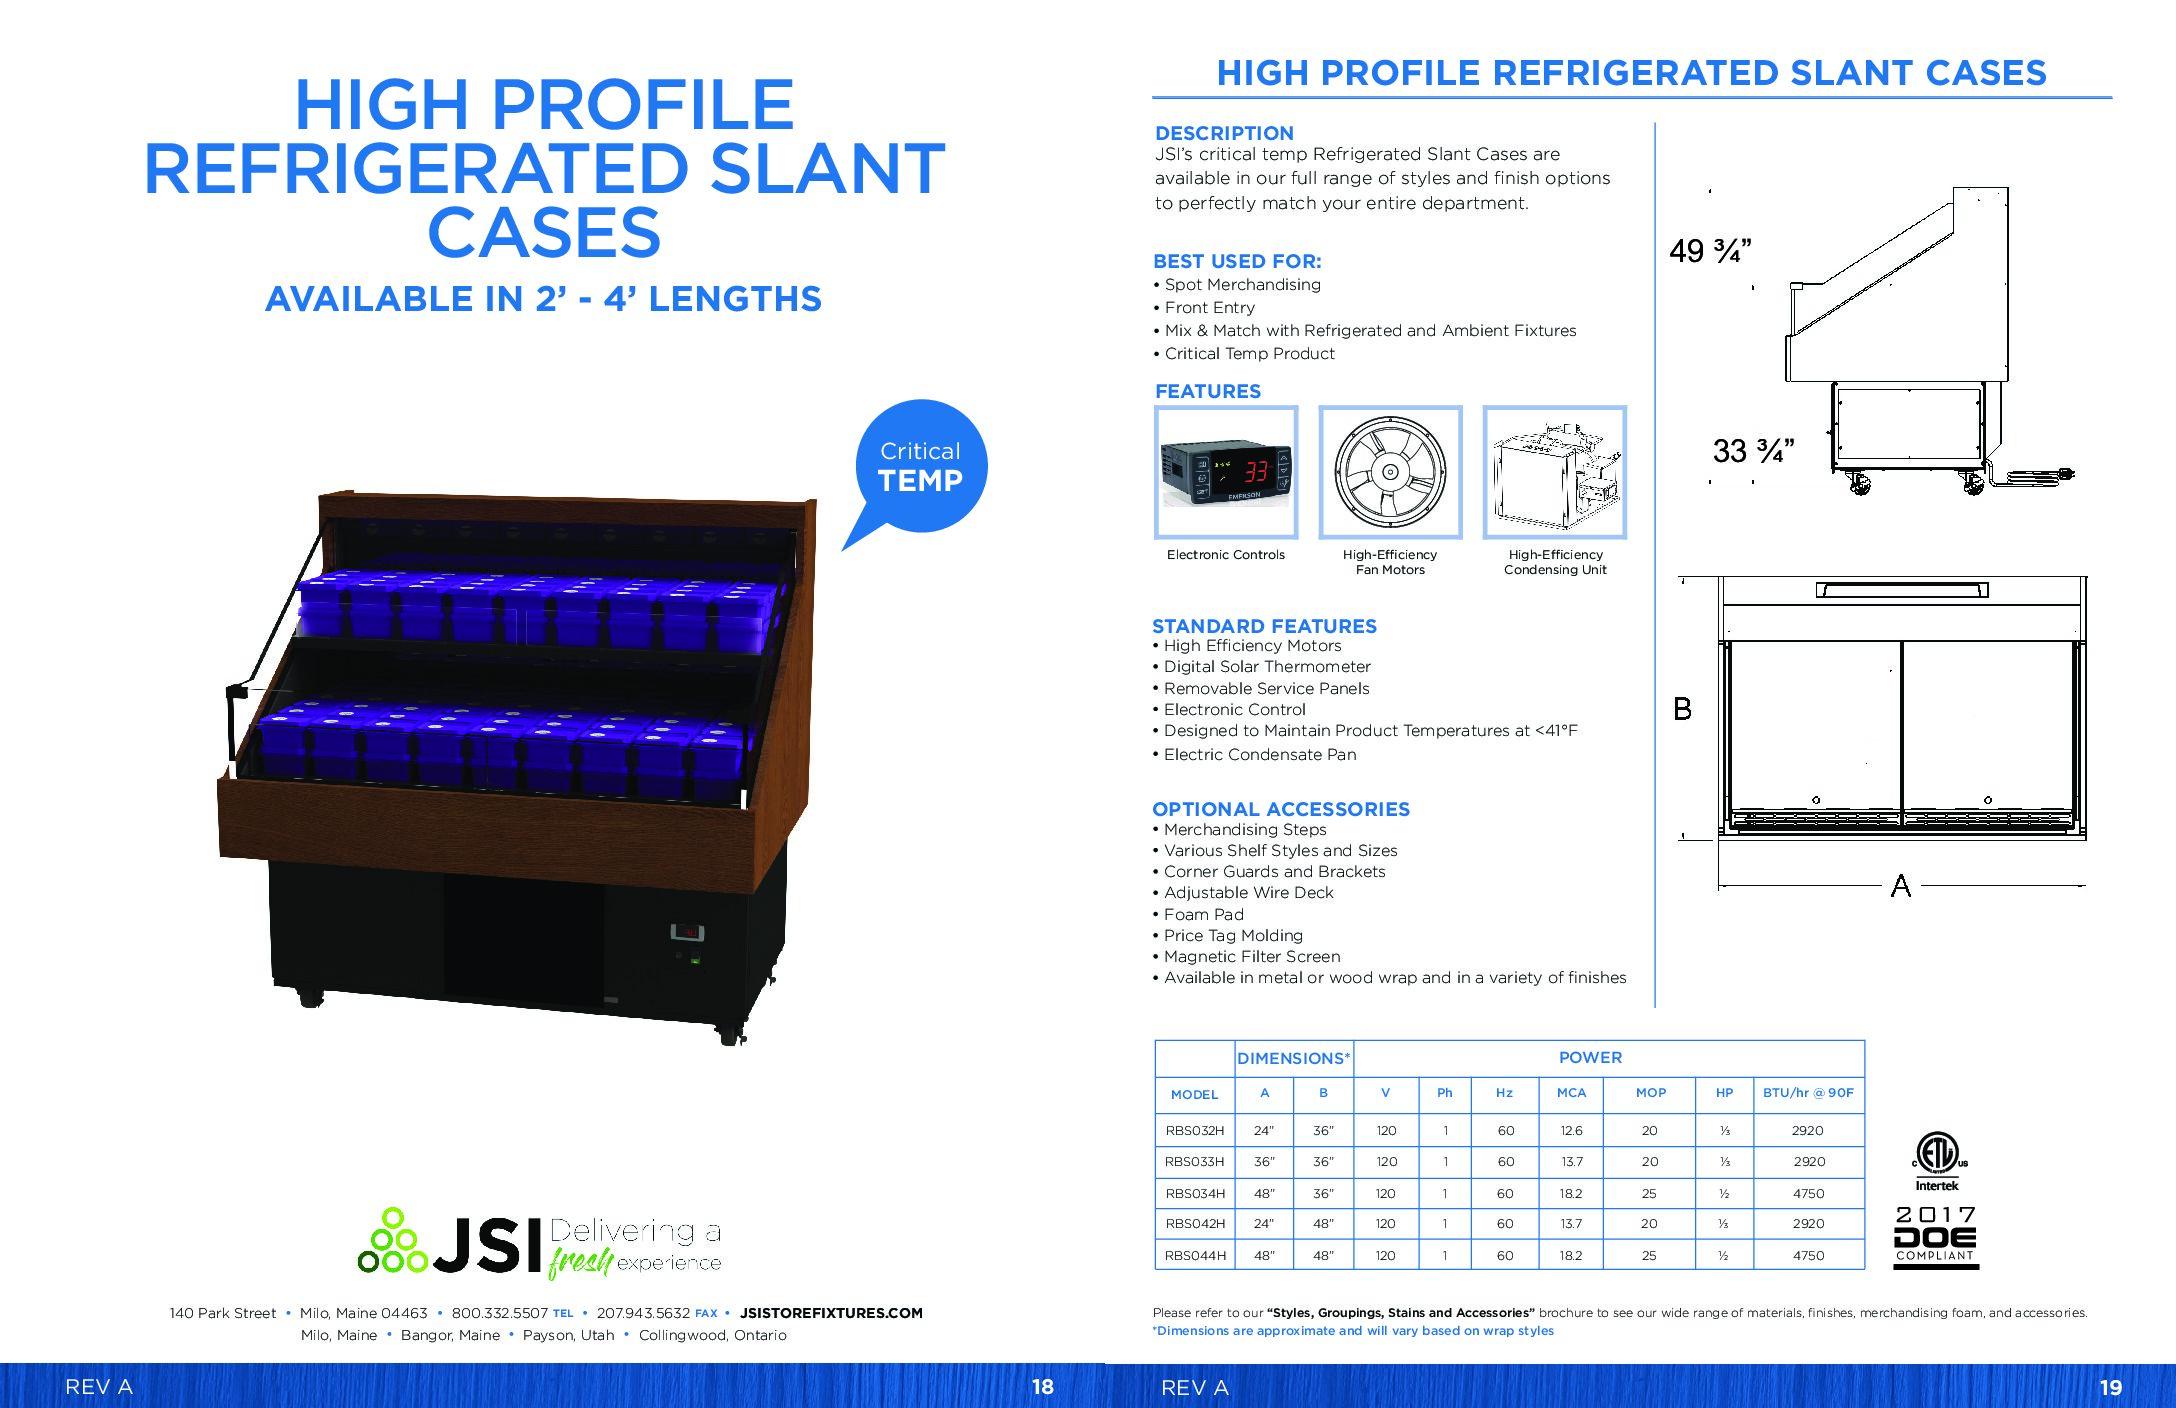 High Profile Refrigerated Slant Cases (PDF)